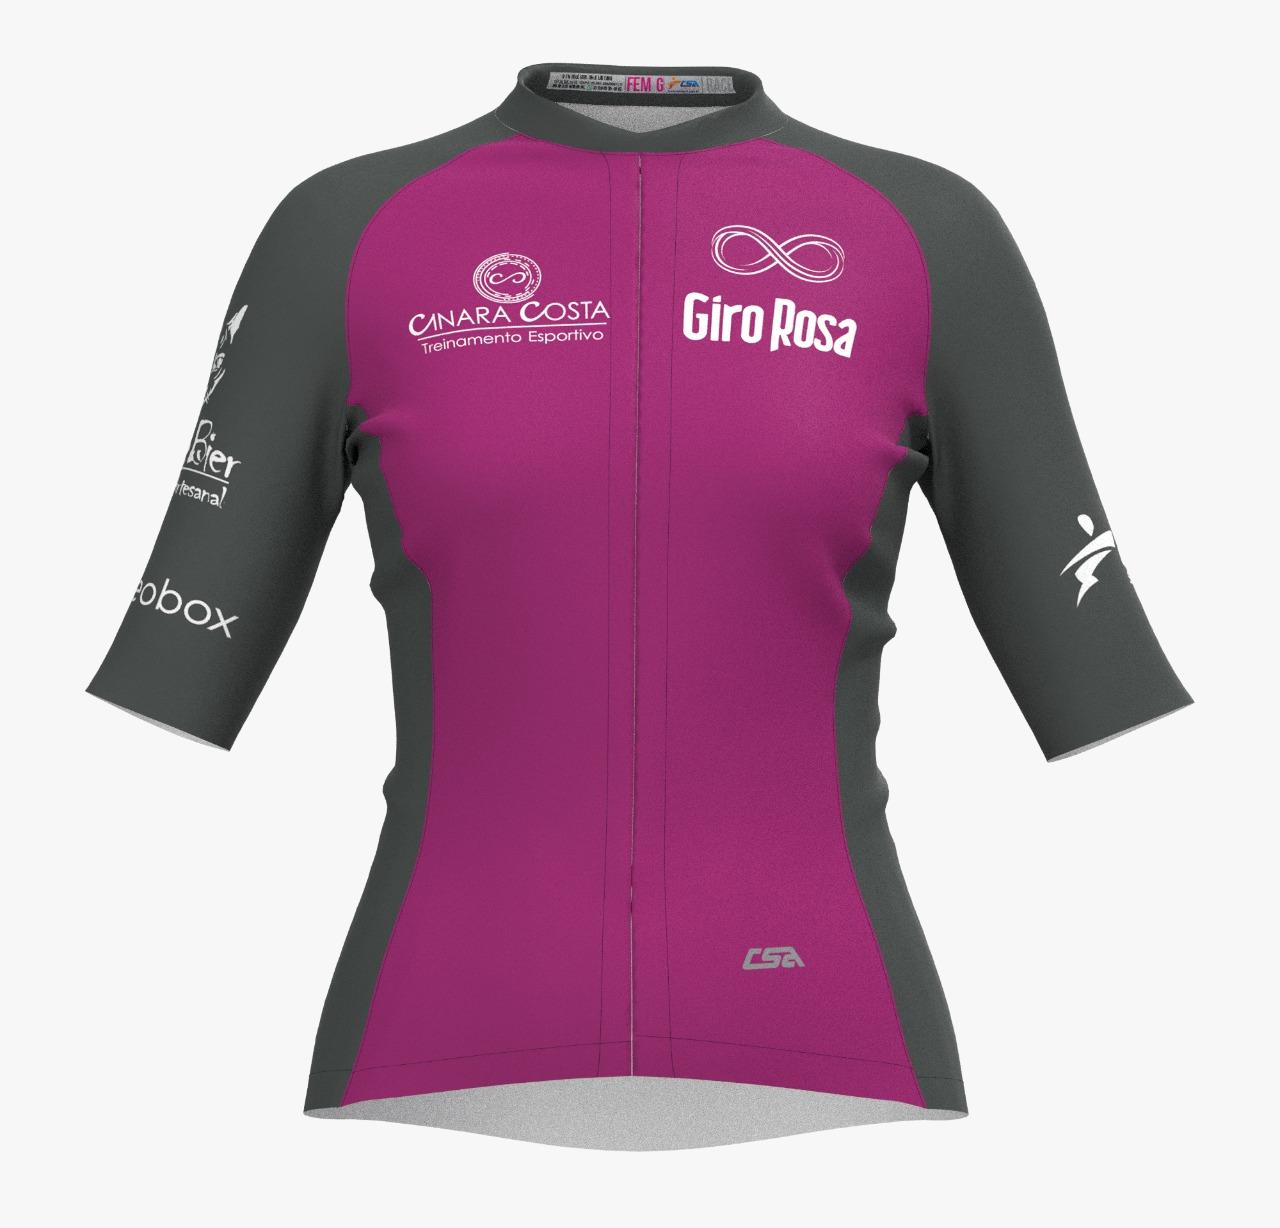 Camisa Ciclista Fast Giro Rosa Manga Curta Feminina